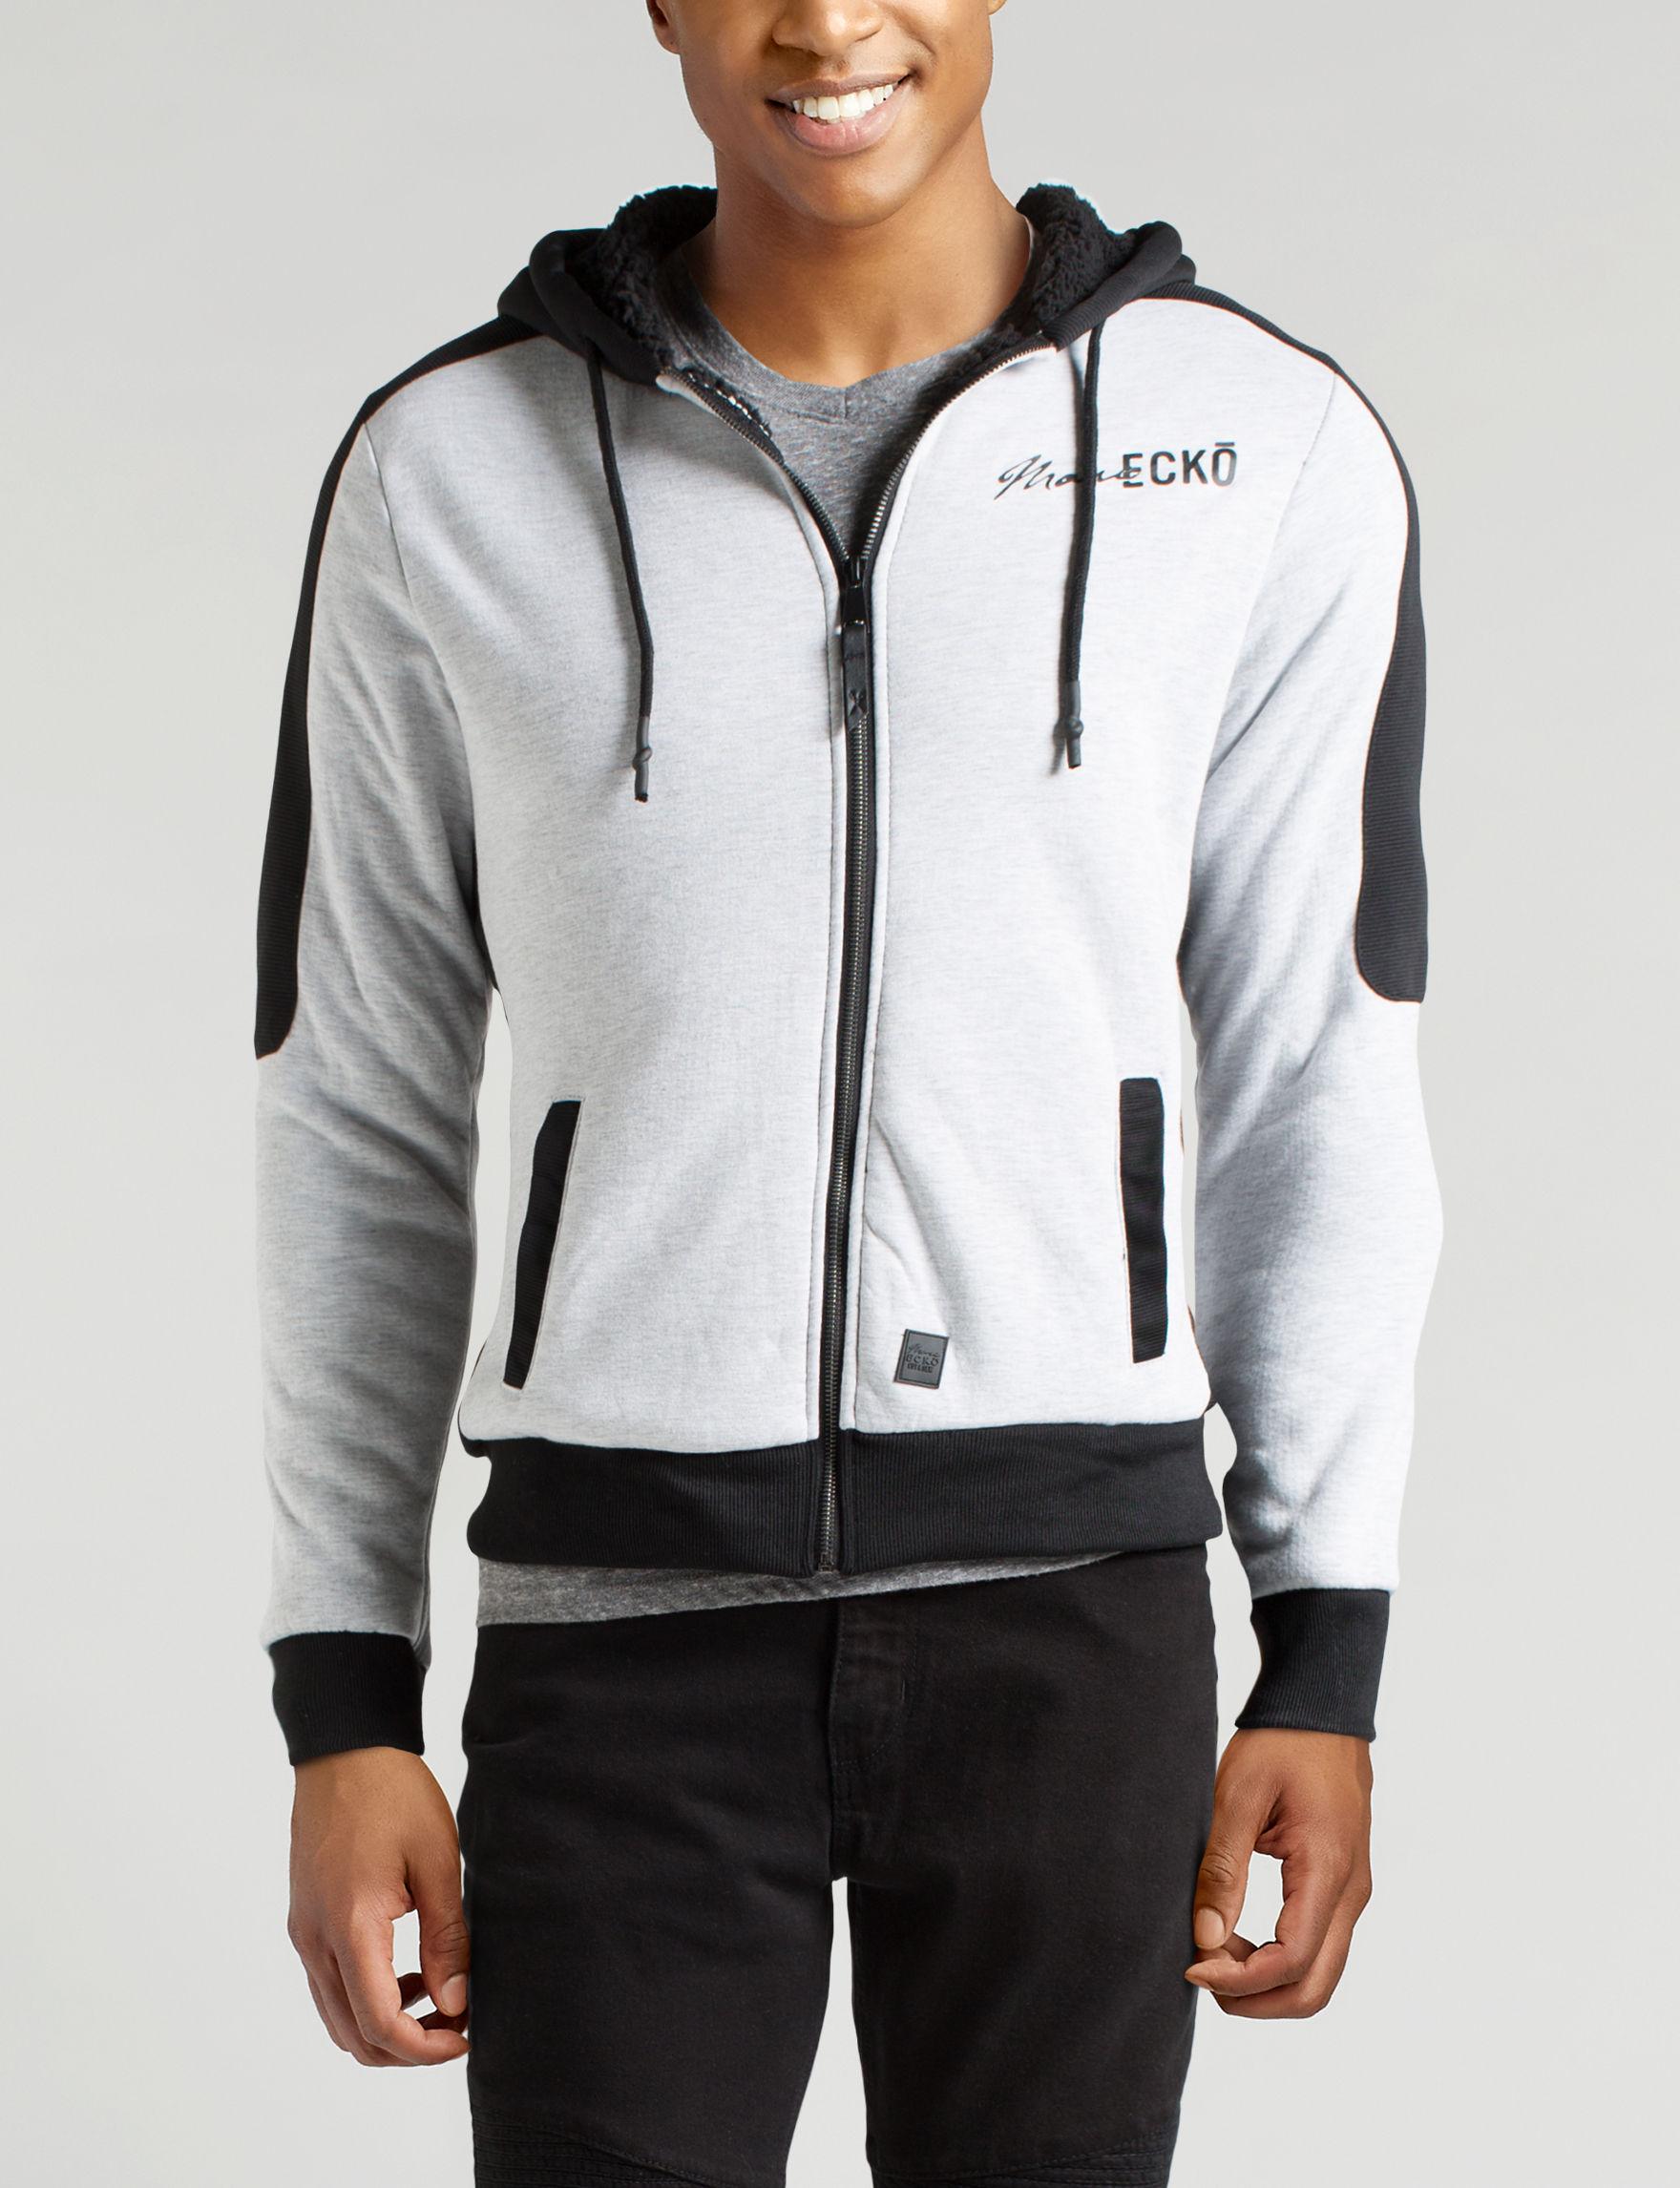 Marc Ecko White / Black Lightweight Jackets & Blazers